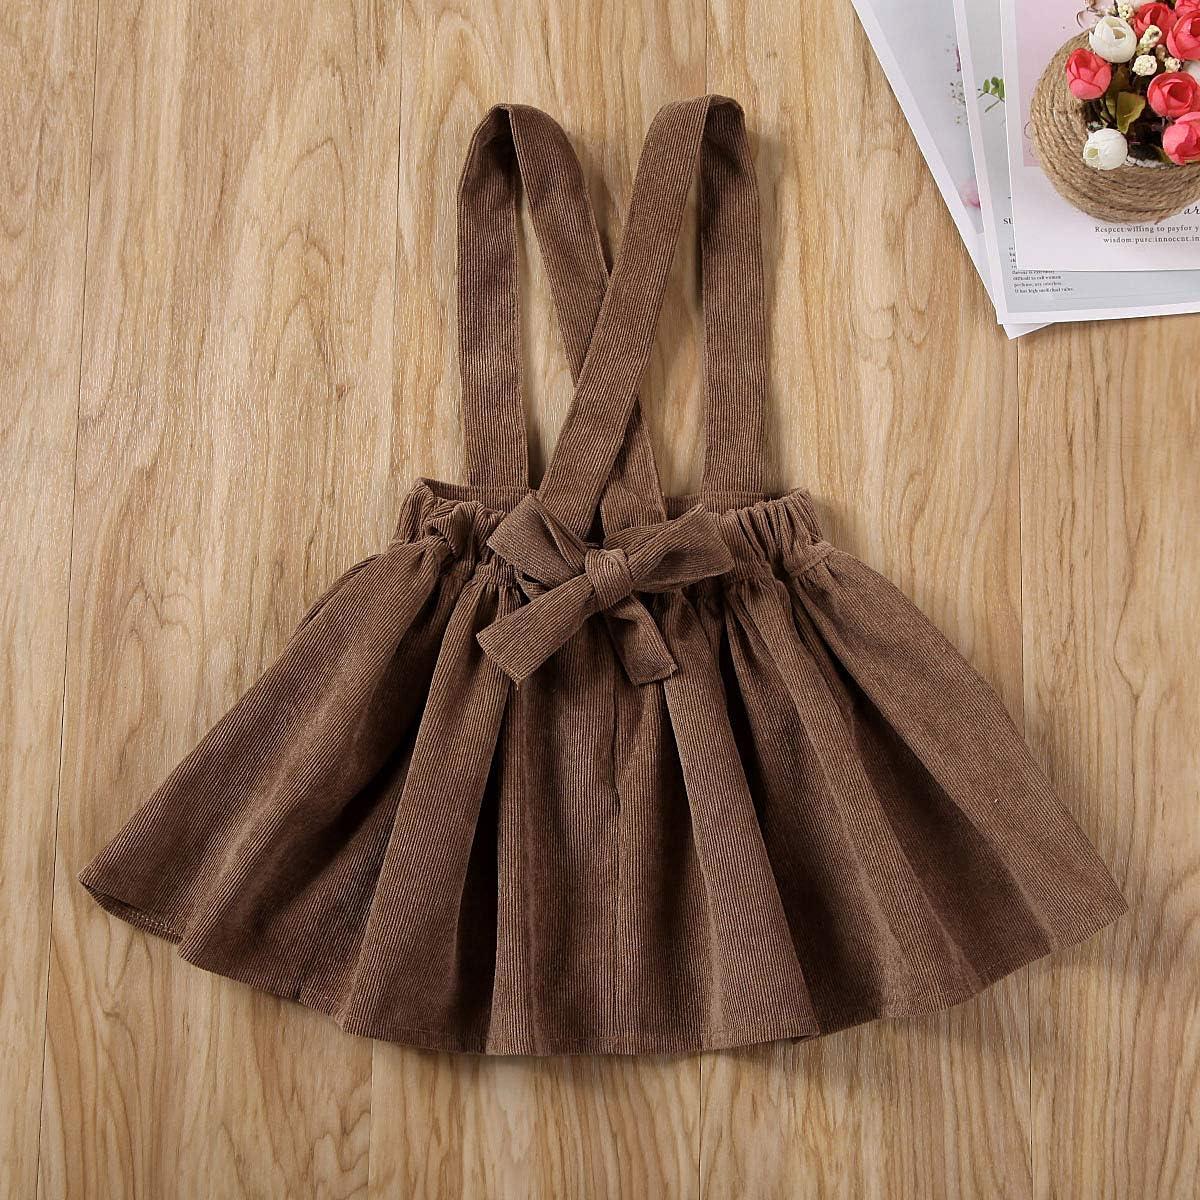 ZAXARRA Toddler Baby Girls Strap Suspender Skirt Overalls Dress Outfit